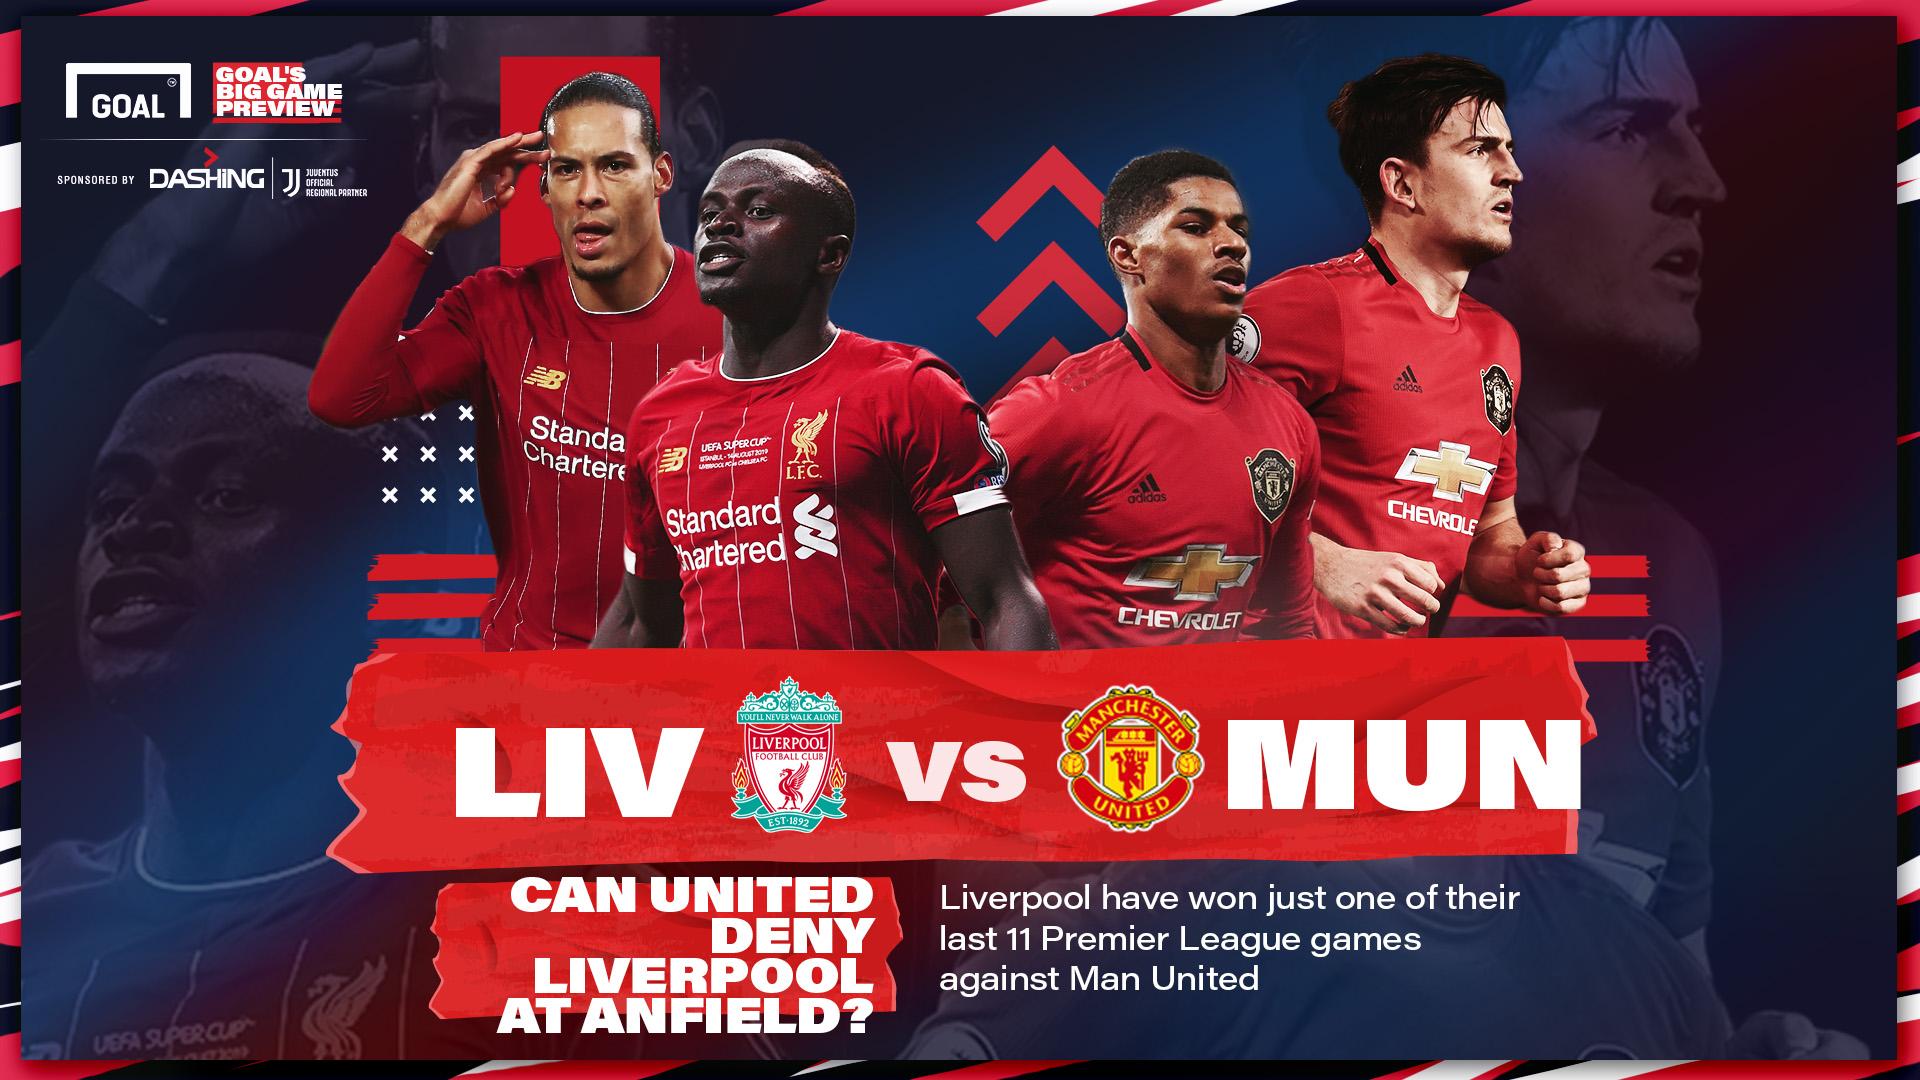 Can Manchester United halt the Liverpool juggernaut?